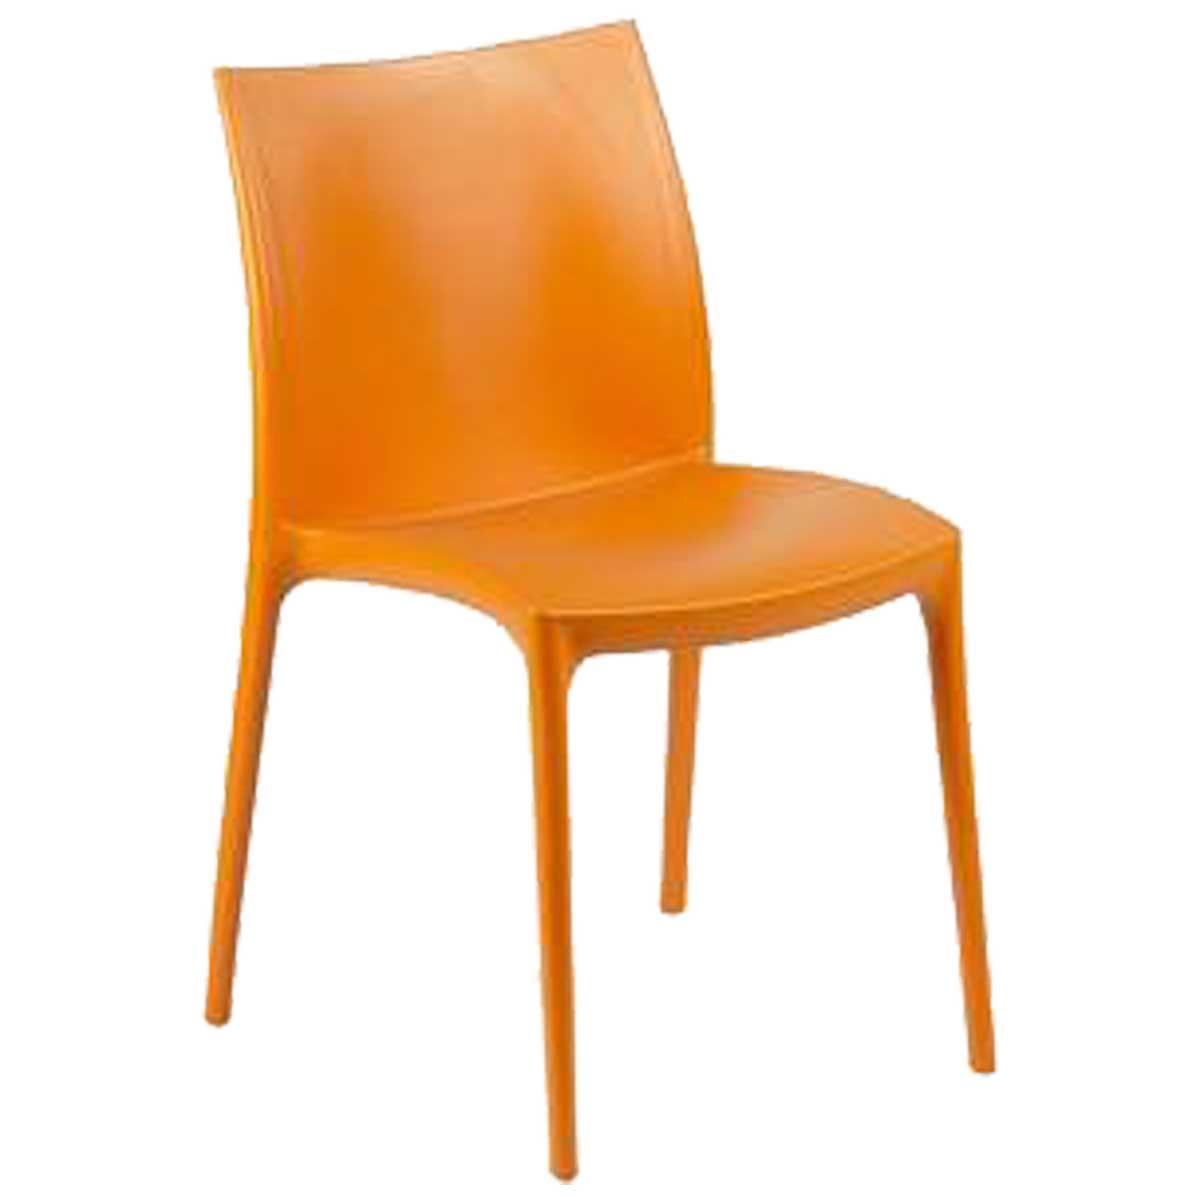 kromy c orange 01 - https://www.werzalit.com/es/producto/kromy-stuhl/